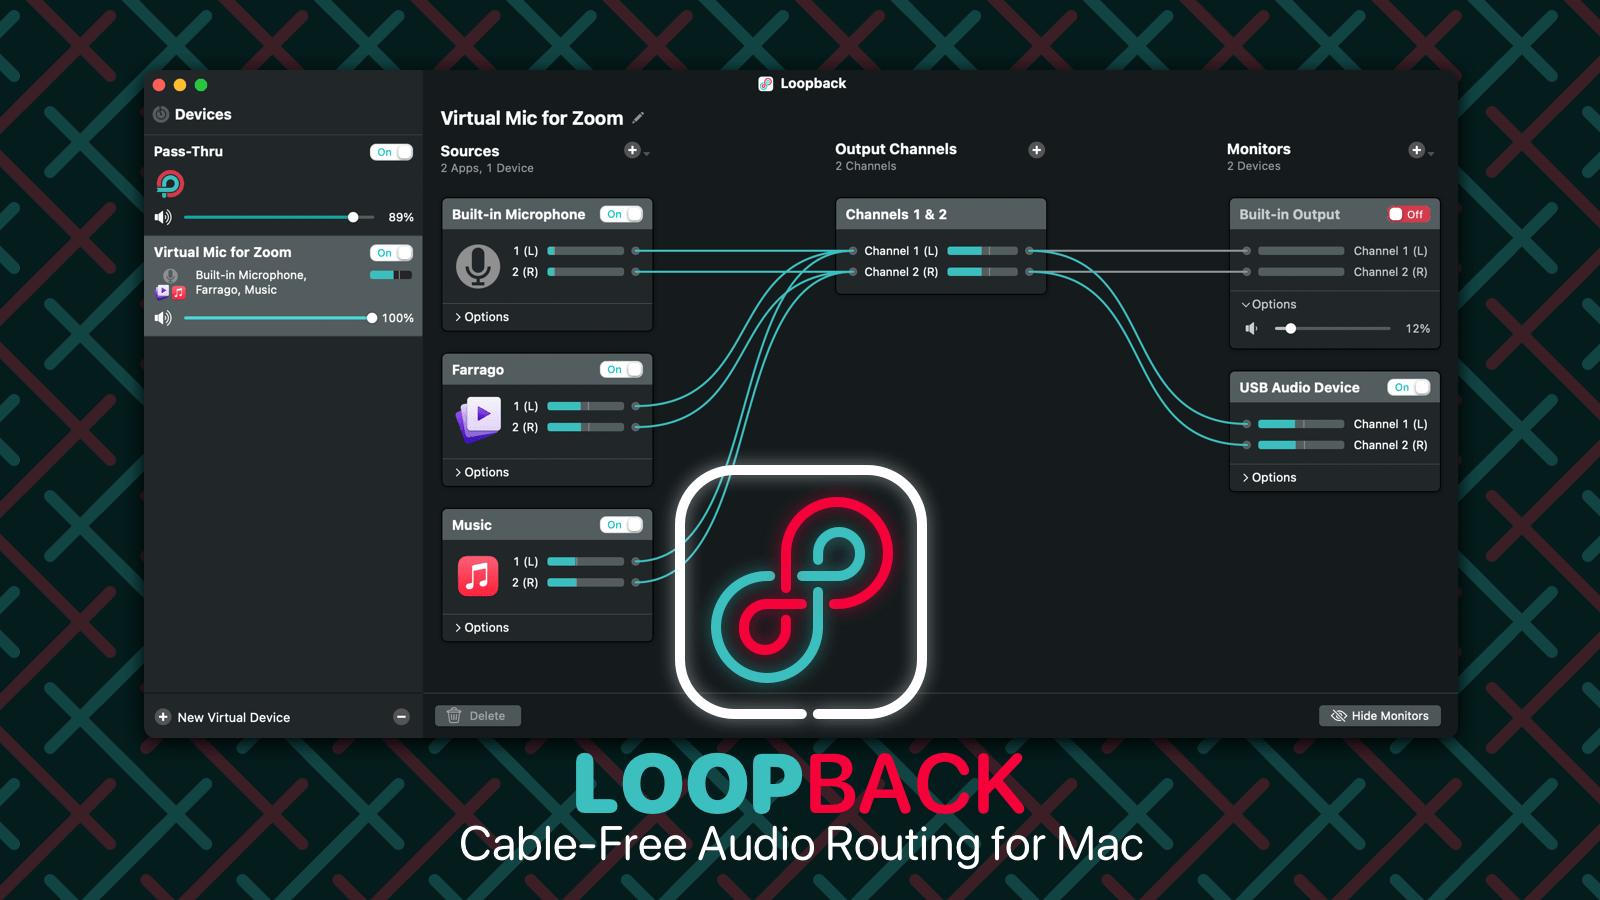 Loopback